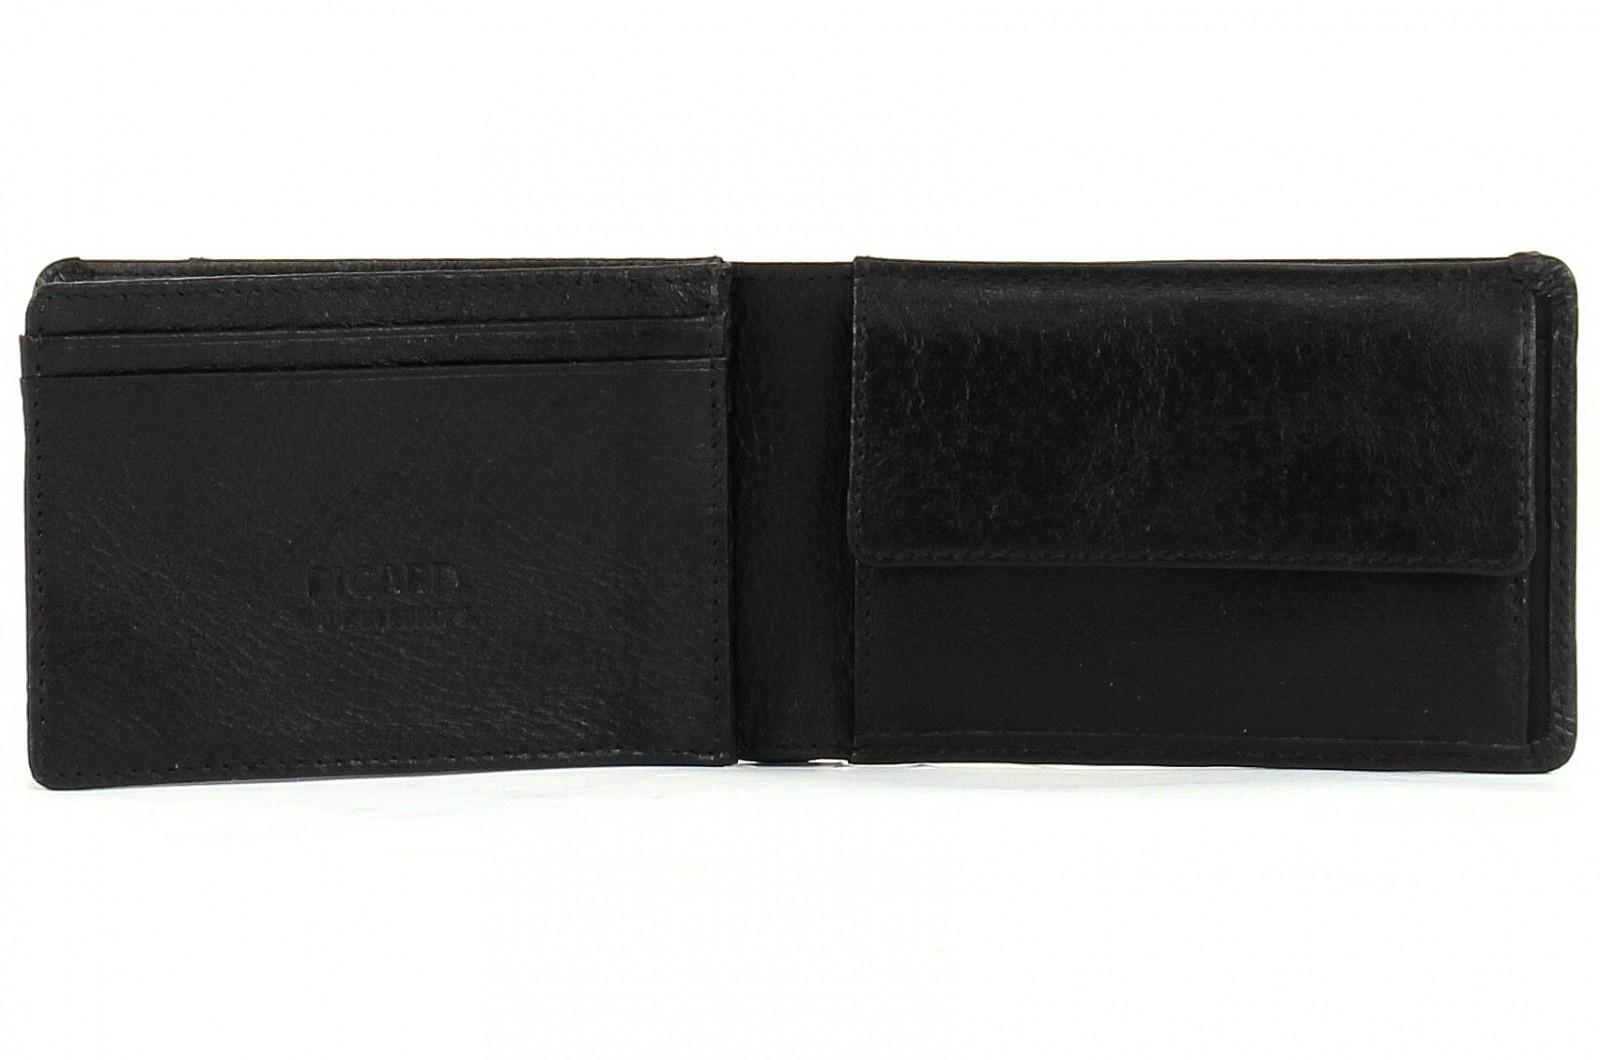 PICARD Buddy 1 Small Wallet Black